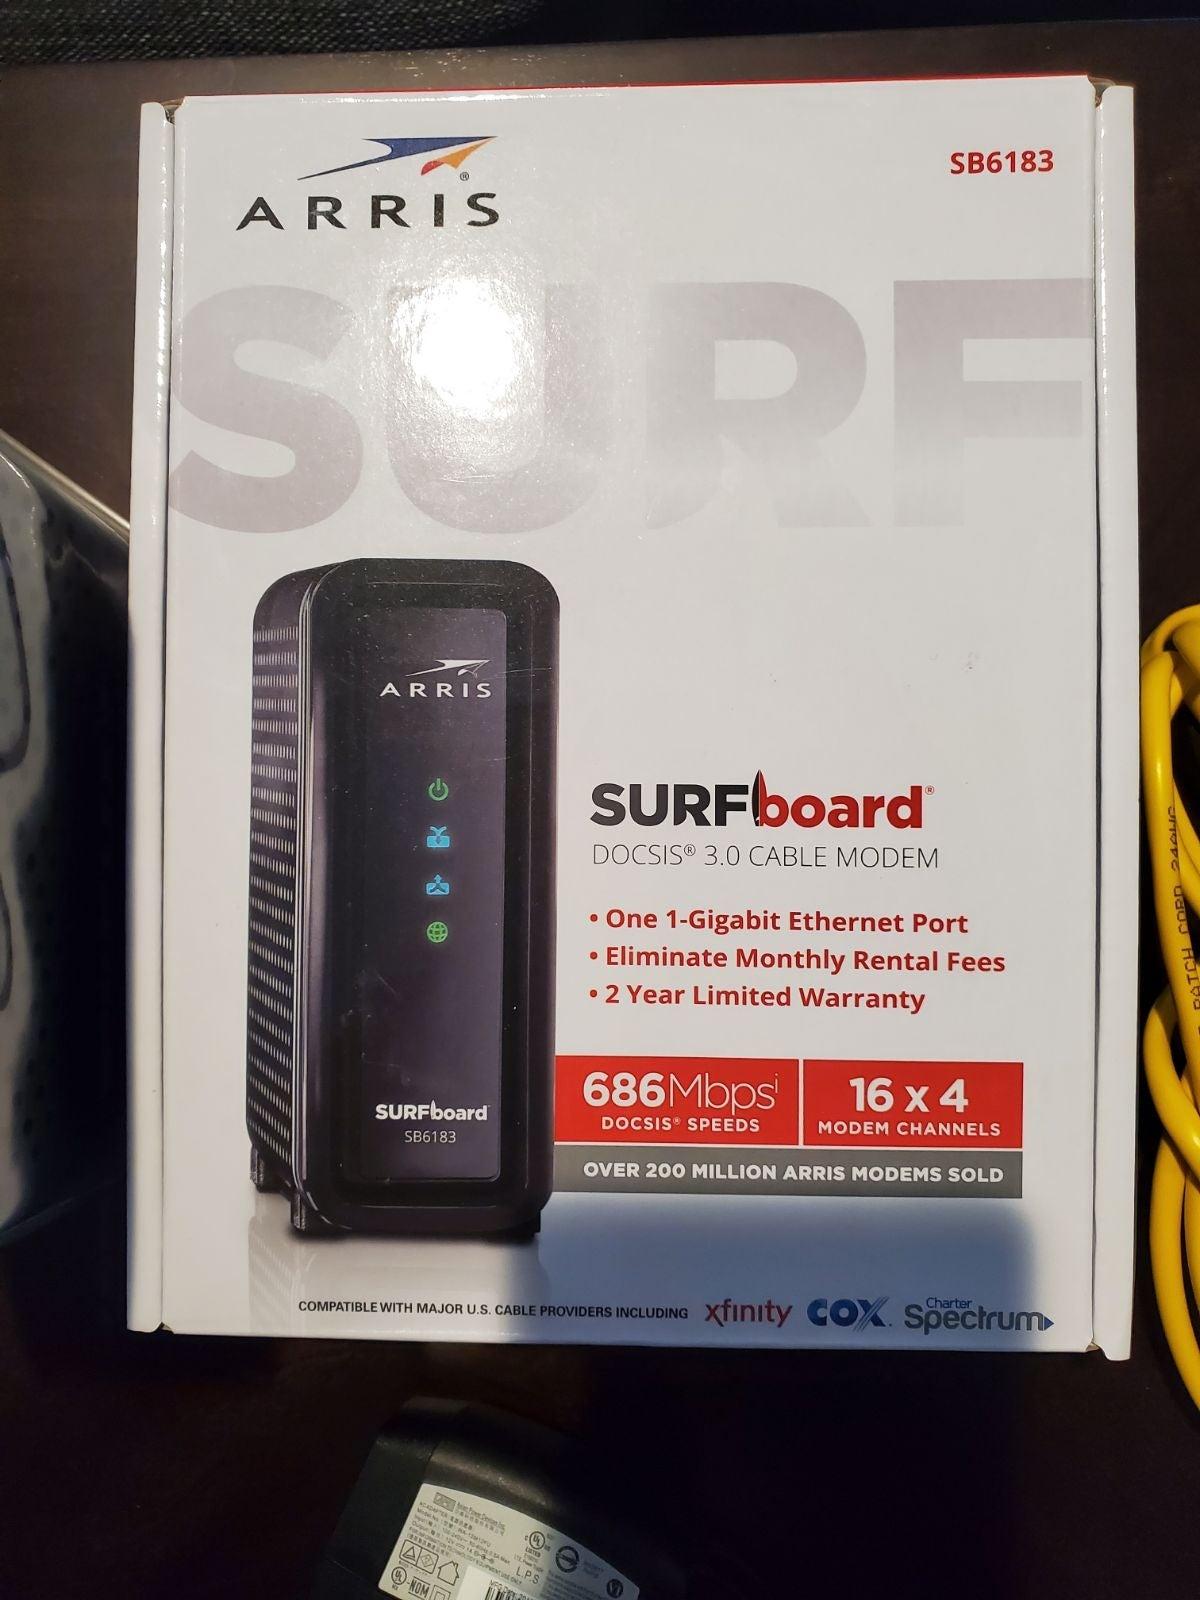 Arris Surfboard Cable modem 686 MBPS